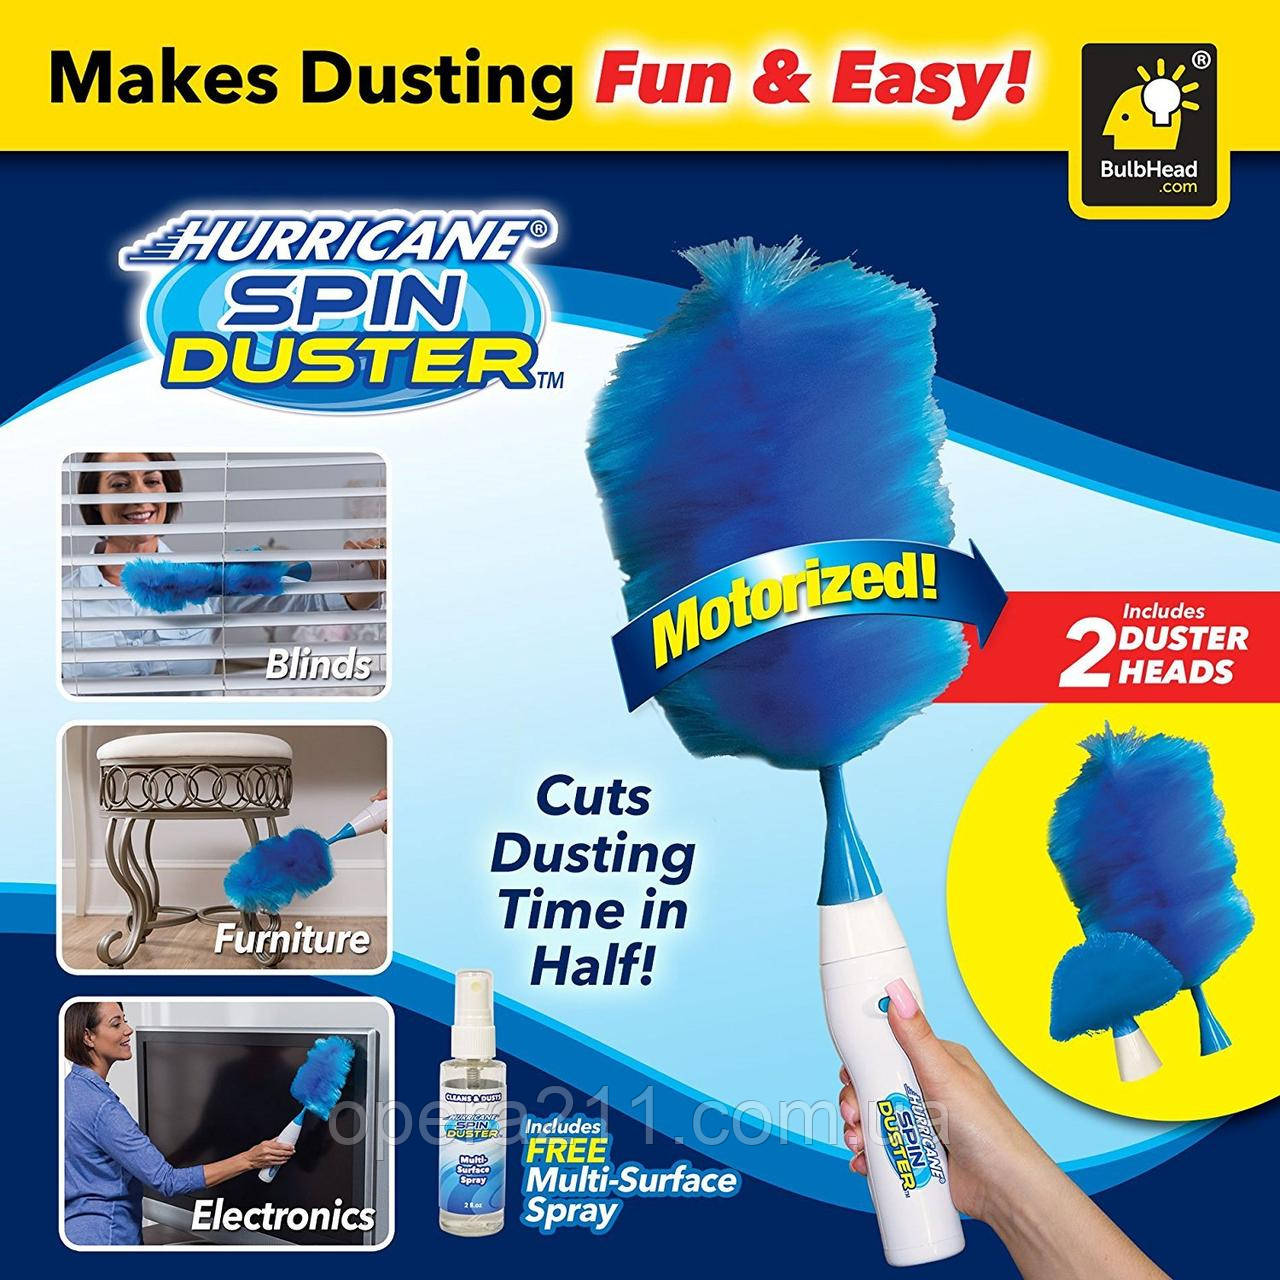 Hurricane spin duster (Харрикан спин дастер) - электрическая щетка для удаления пыли (AS SEEN ON TV)